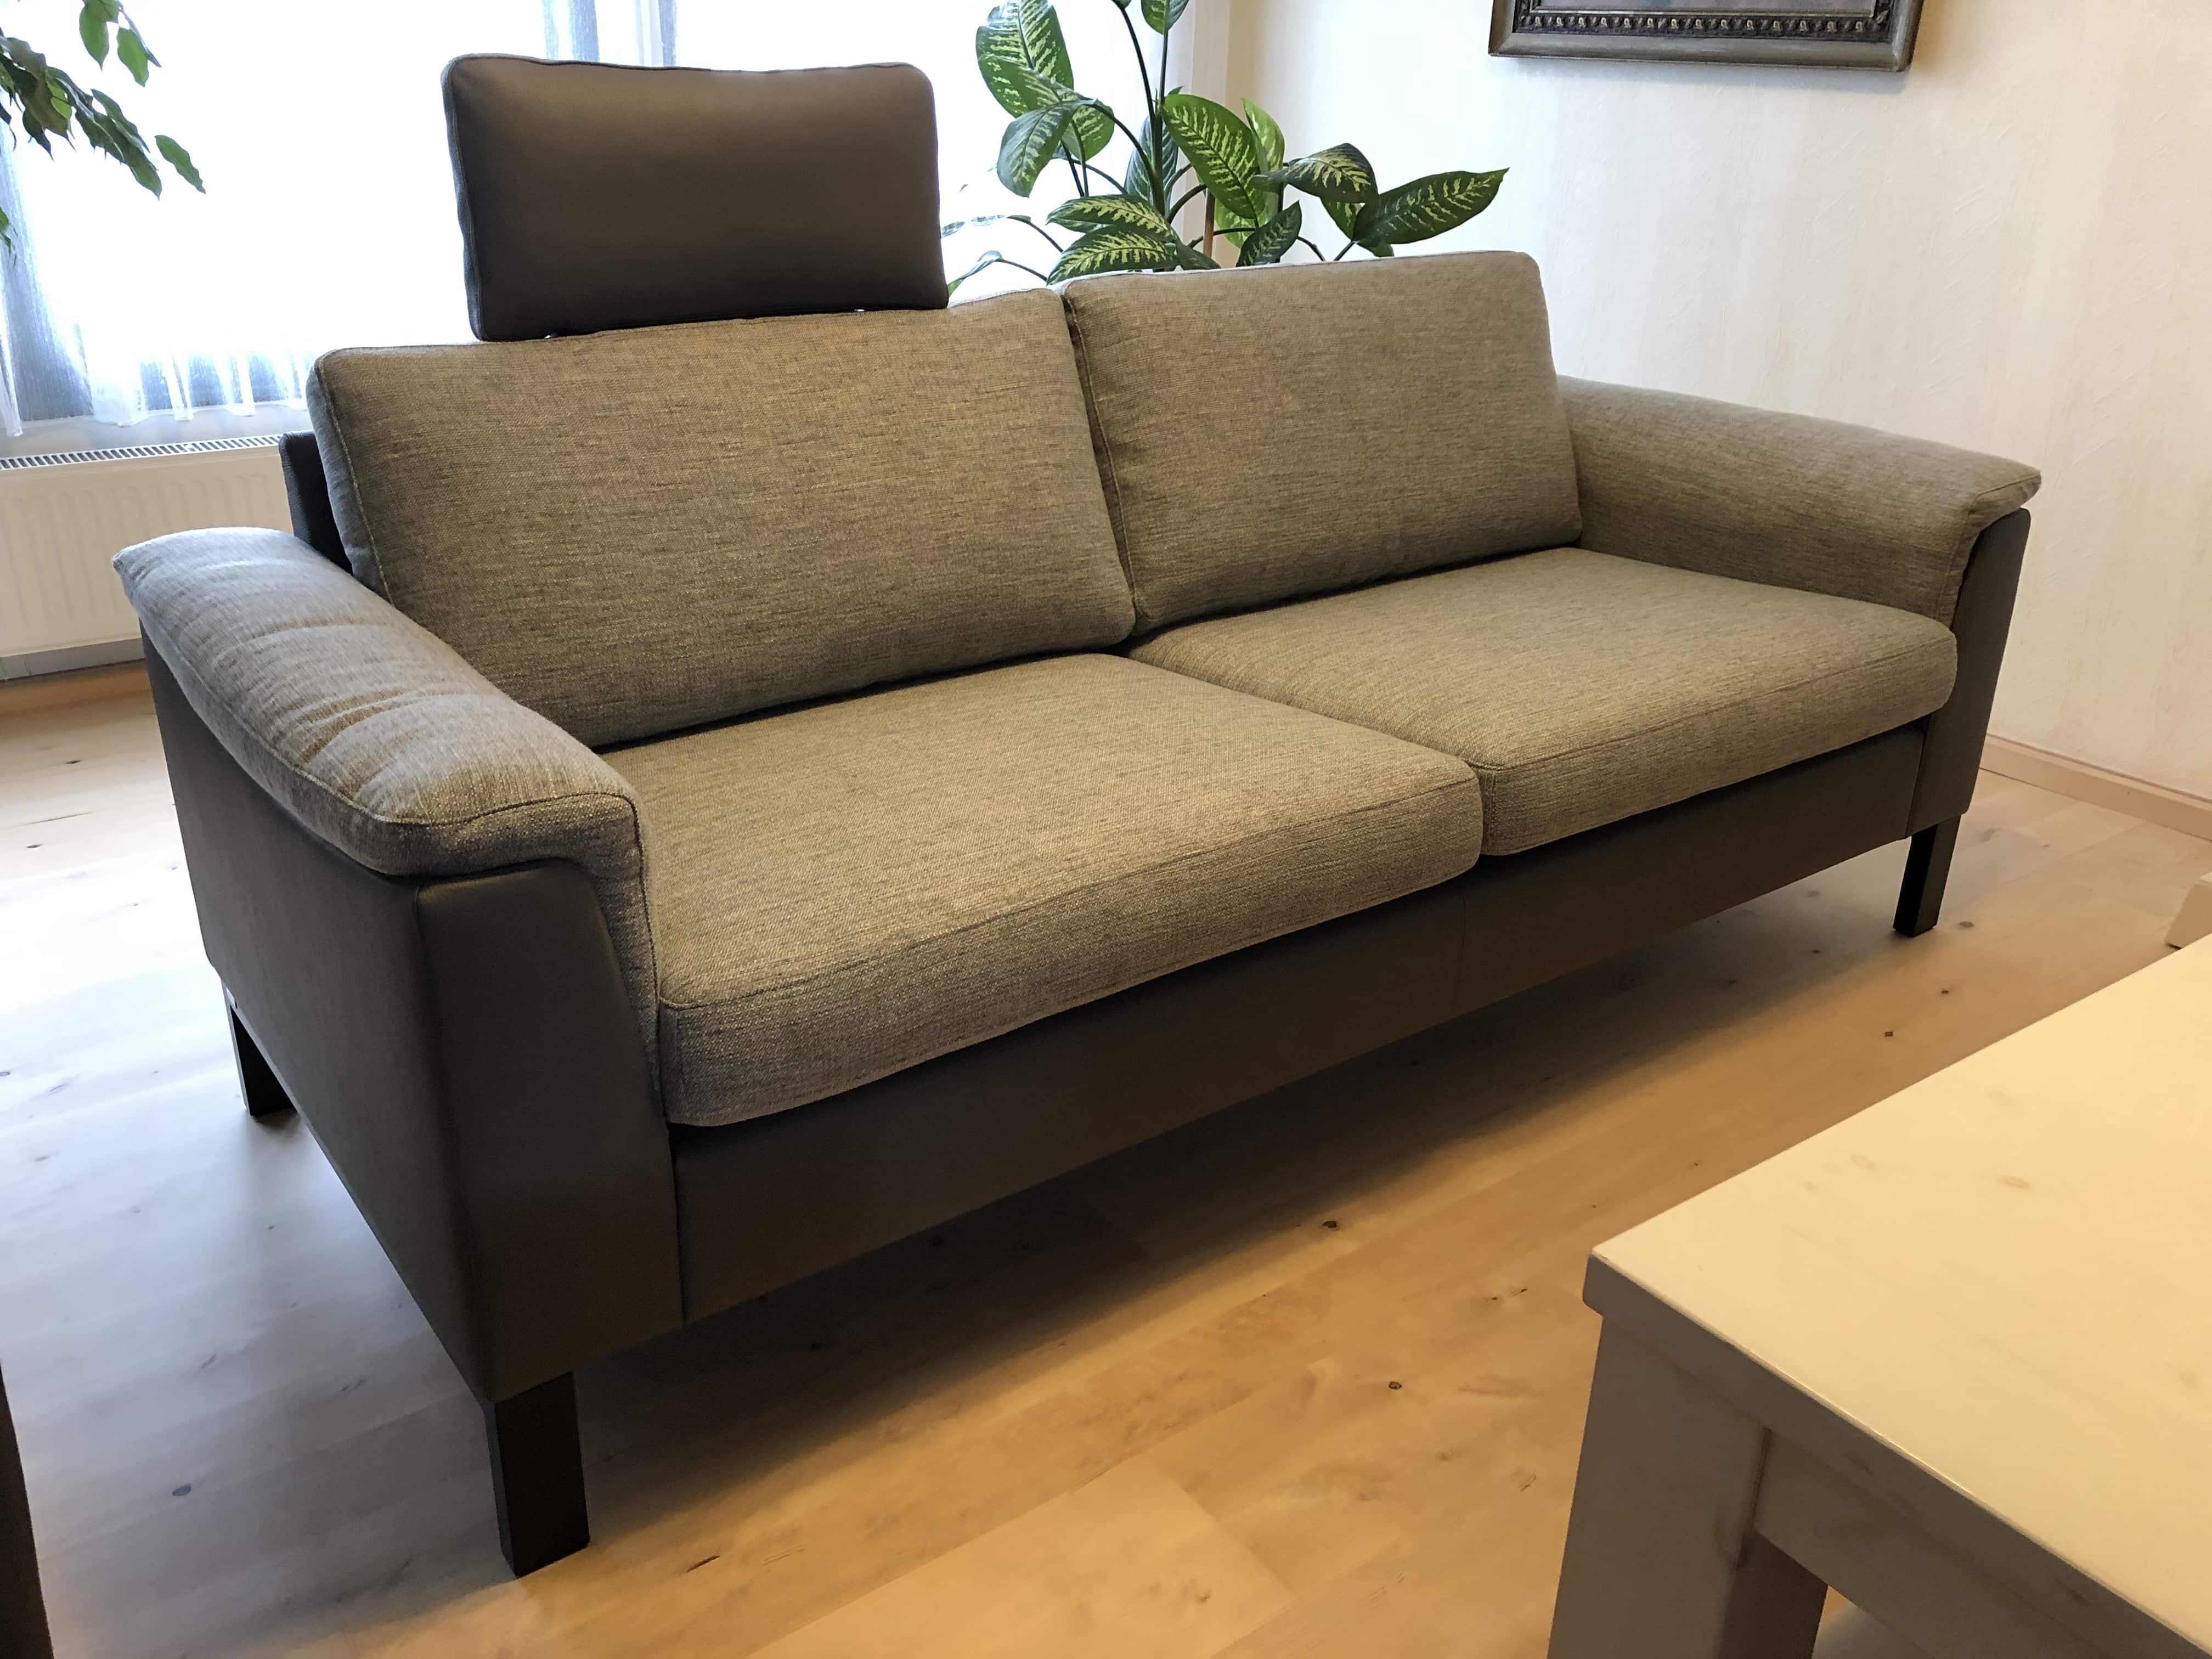 Sofa Timeless